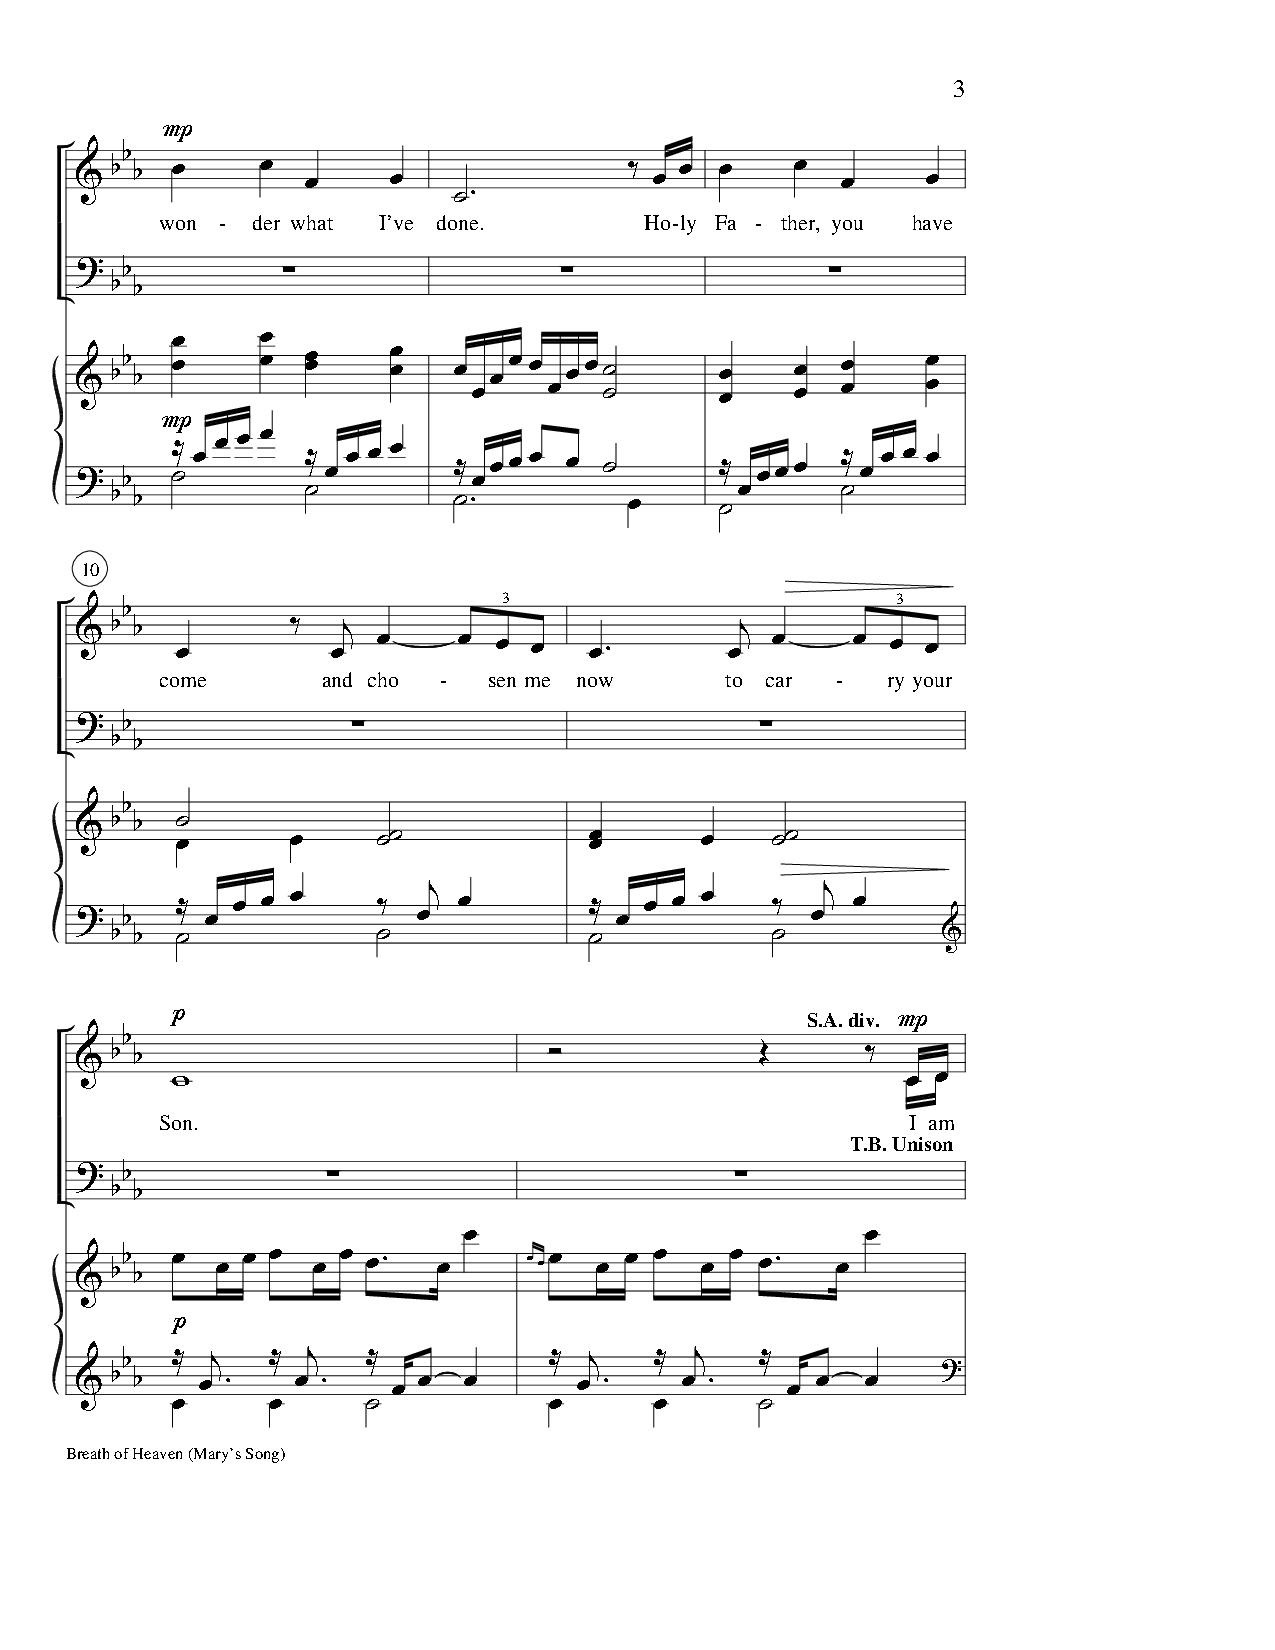 breath of heaven piano sheet music